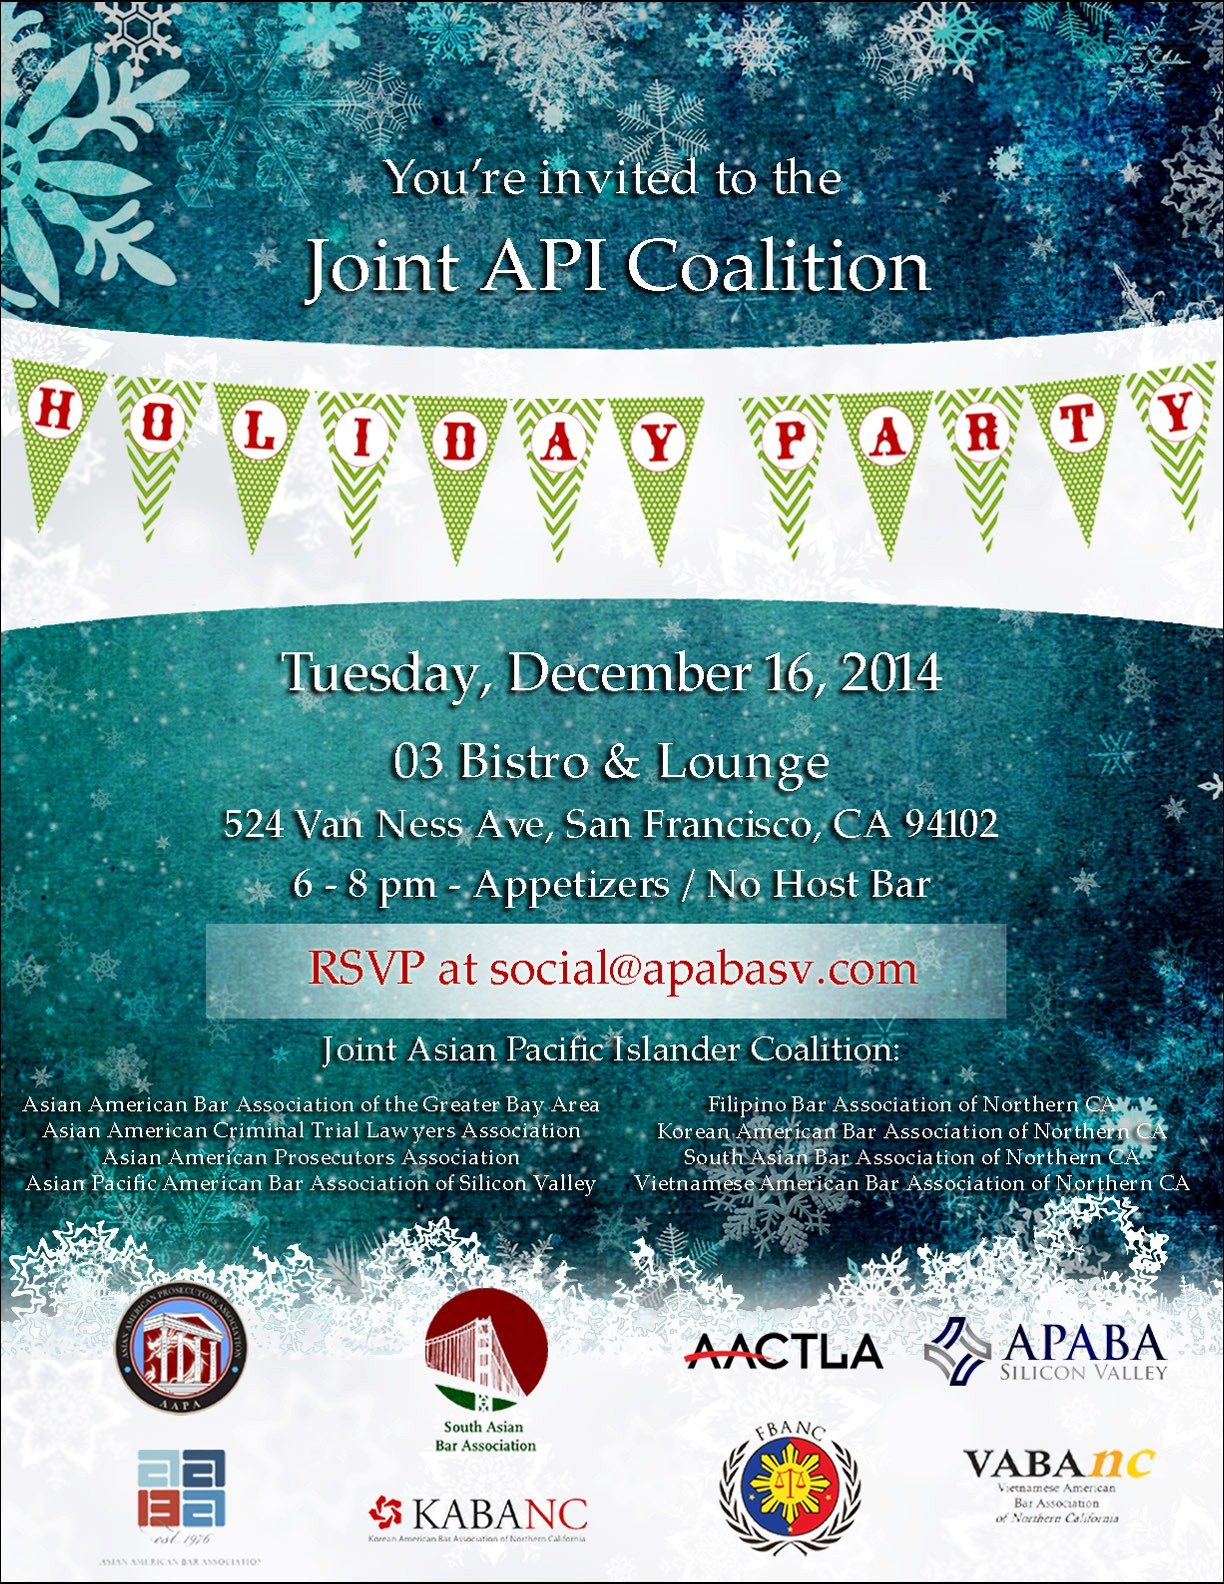 Joint API Coalition - Holiday Party.jpg